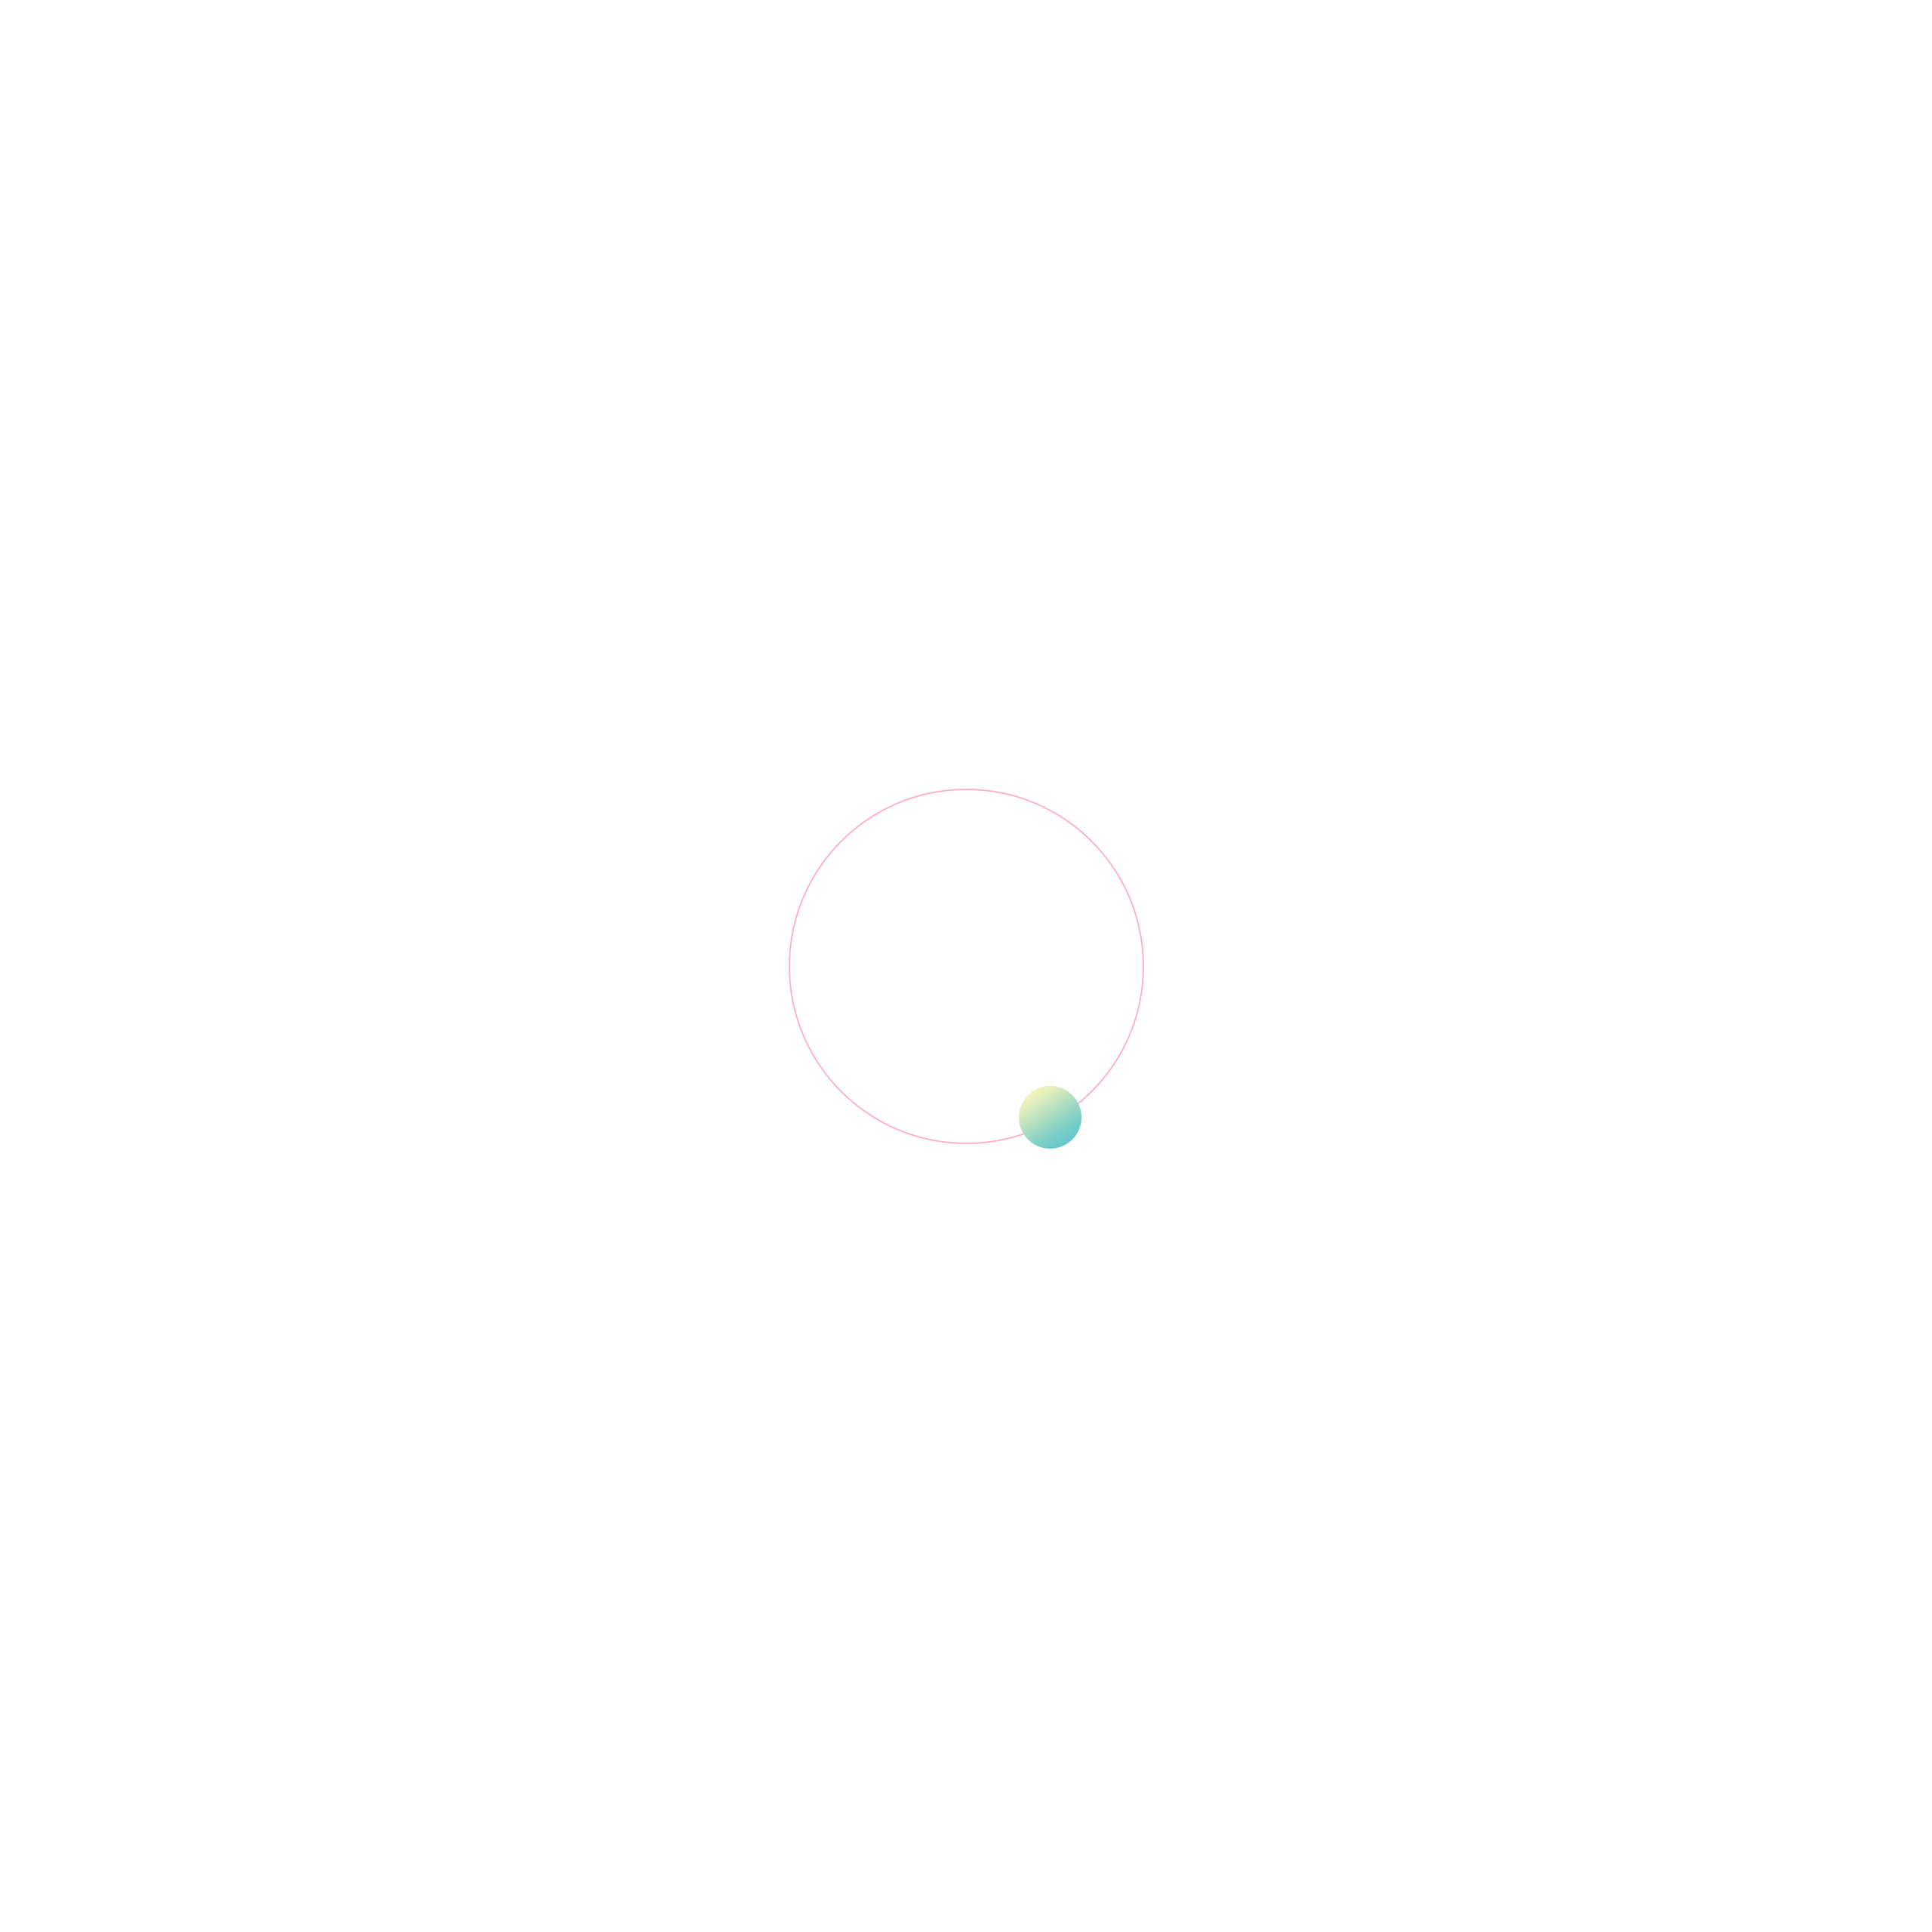 meng-he-brewgorithm-ani-3